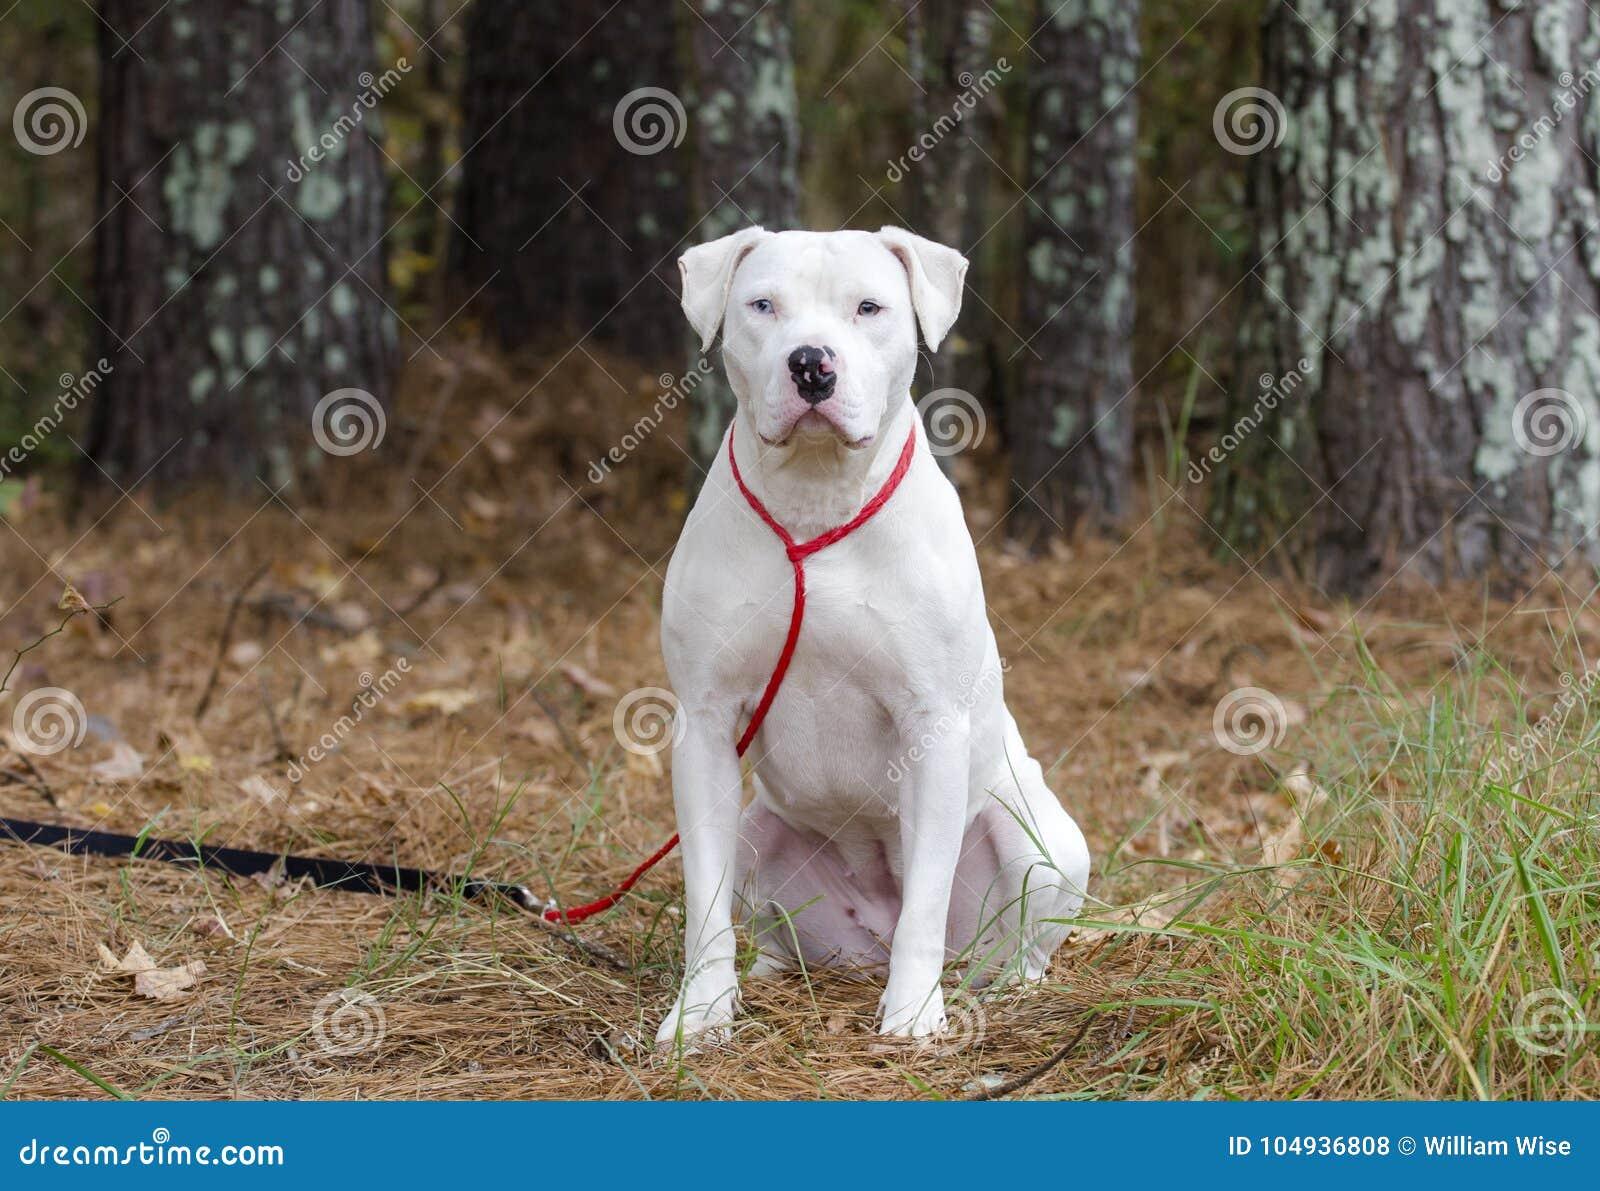 White American Pitbull Terrier dog with blue eye sitting